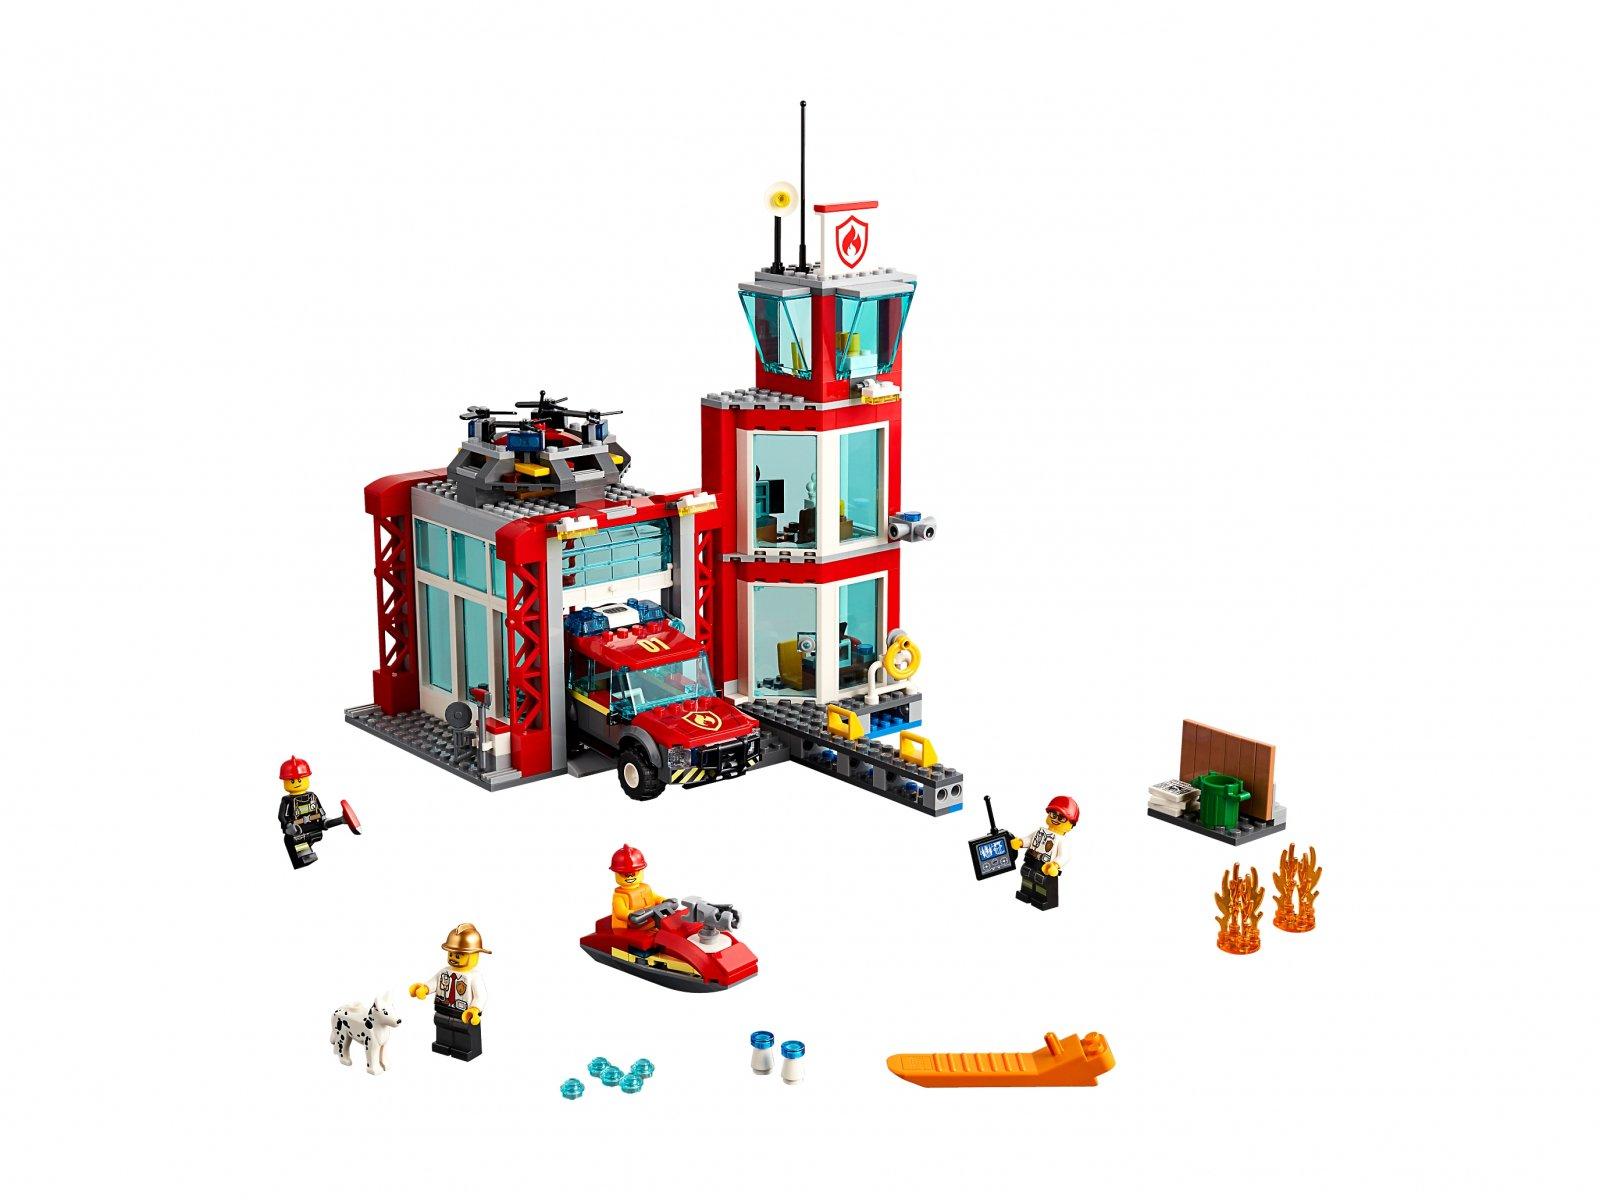 LEGO 60215 City Remiza strażacka